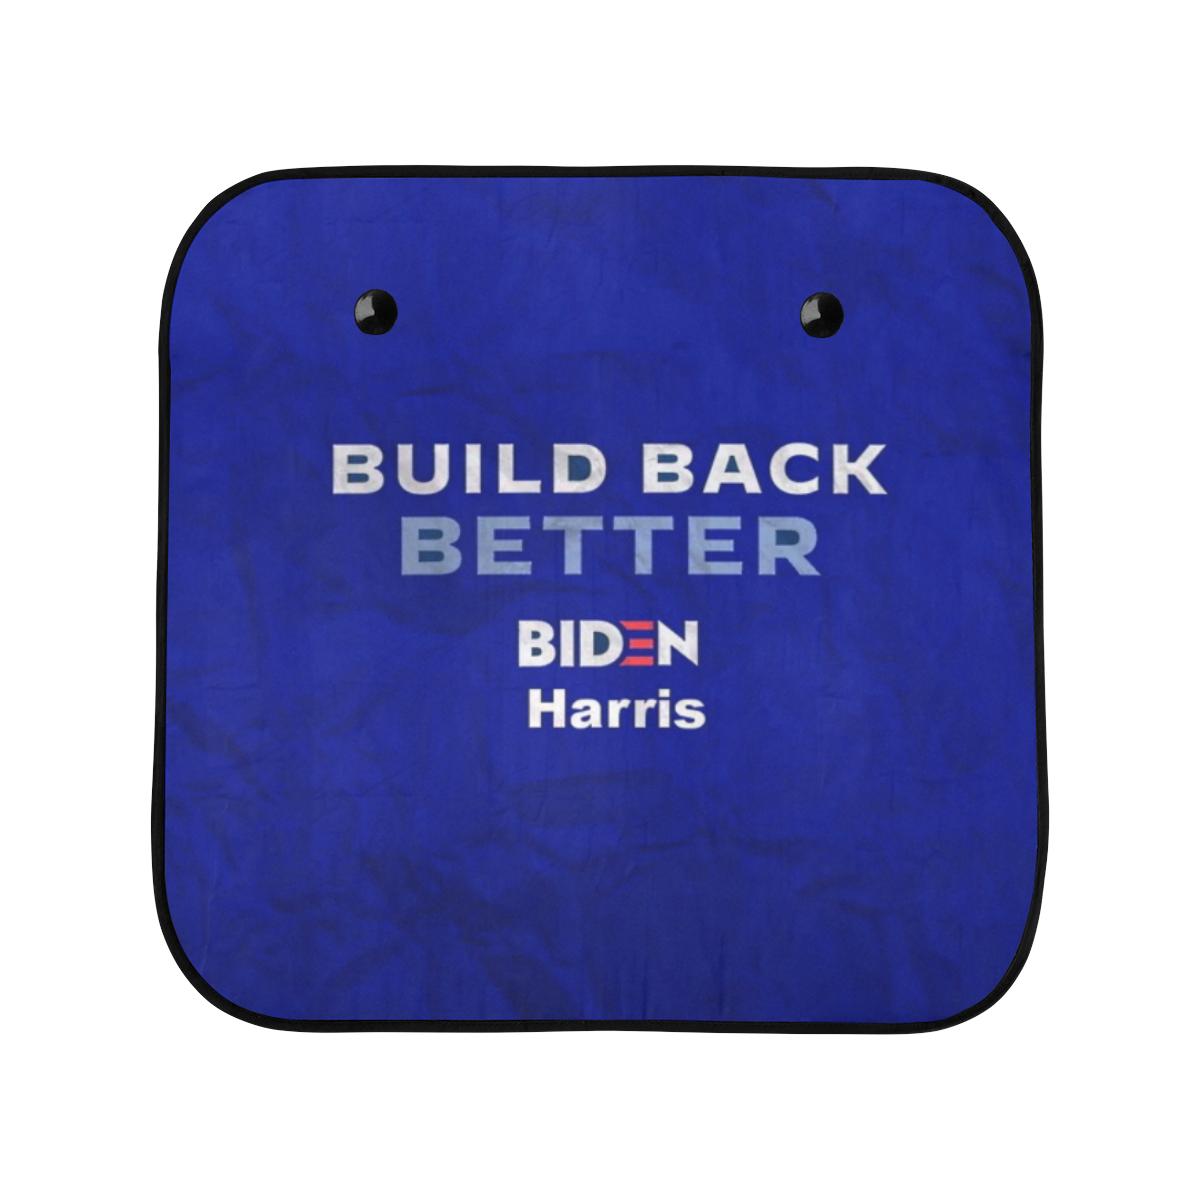 "Biden - Harris 2020 by Artdream Car Sun Shade 28""x28""x2pcs"